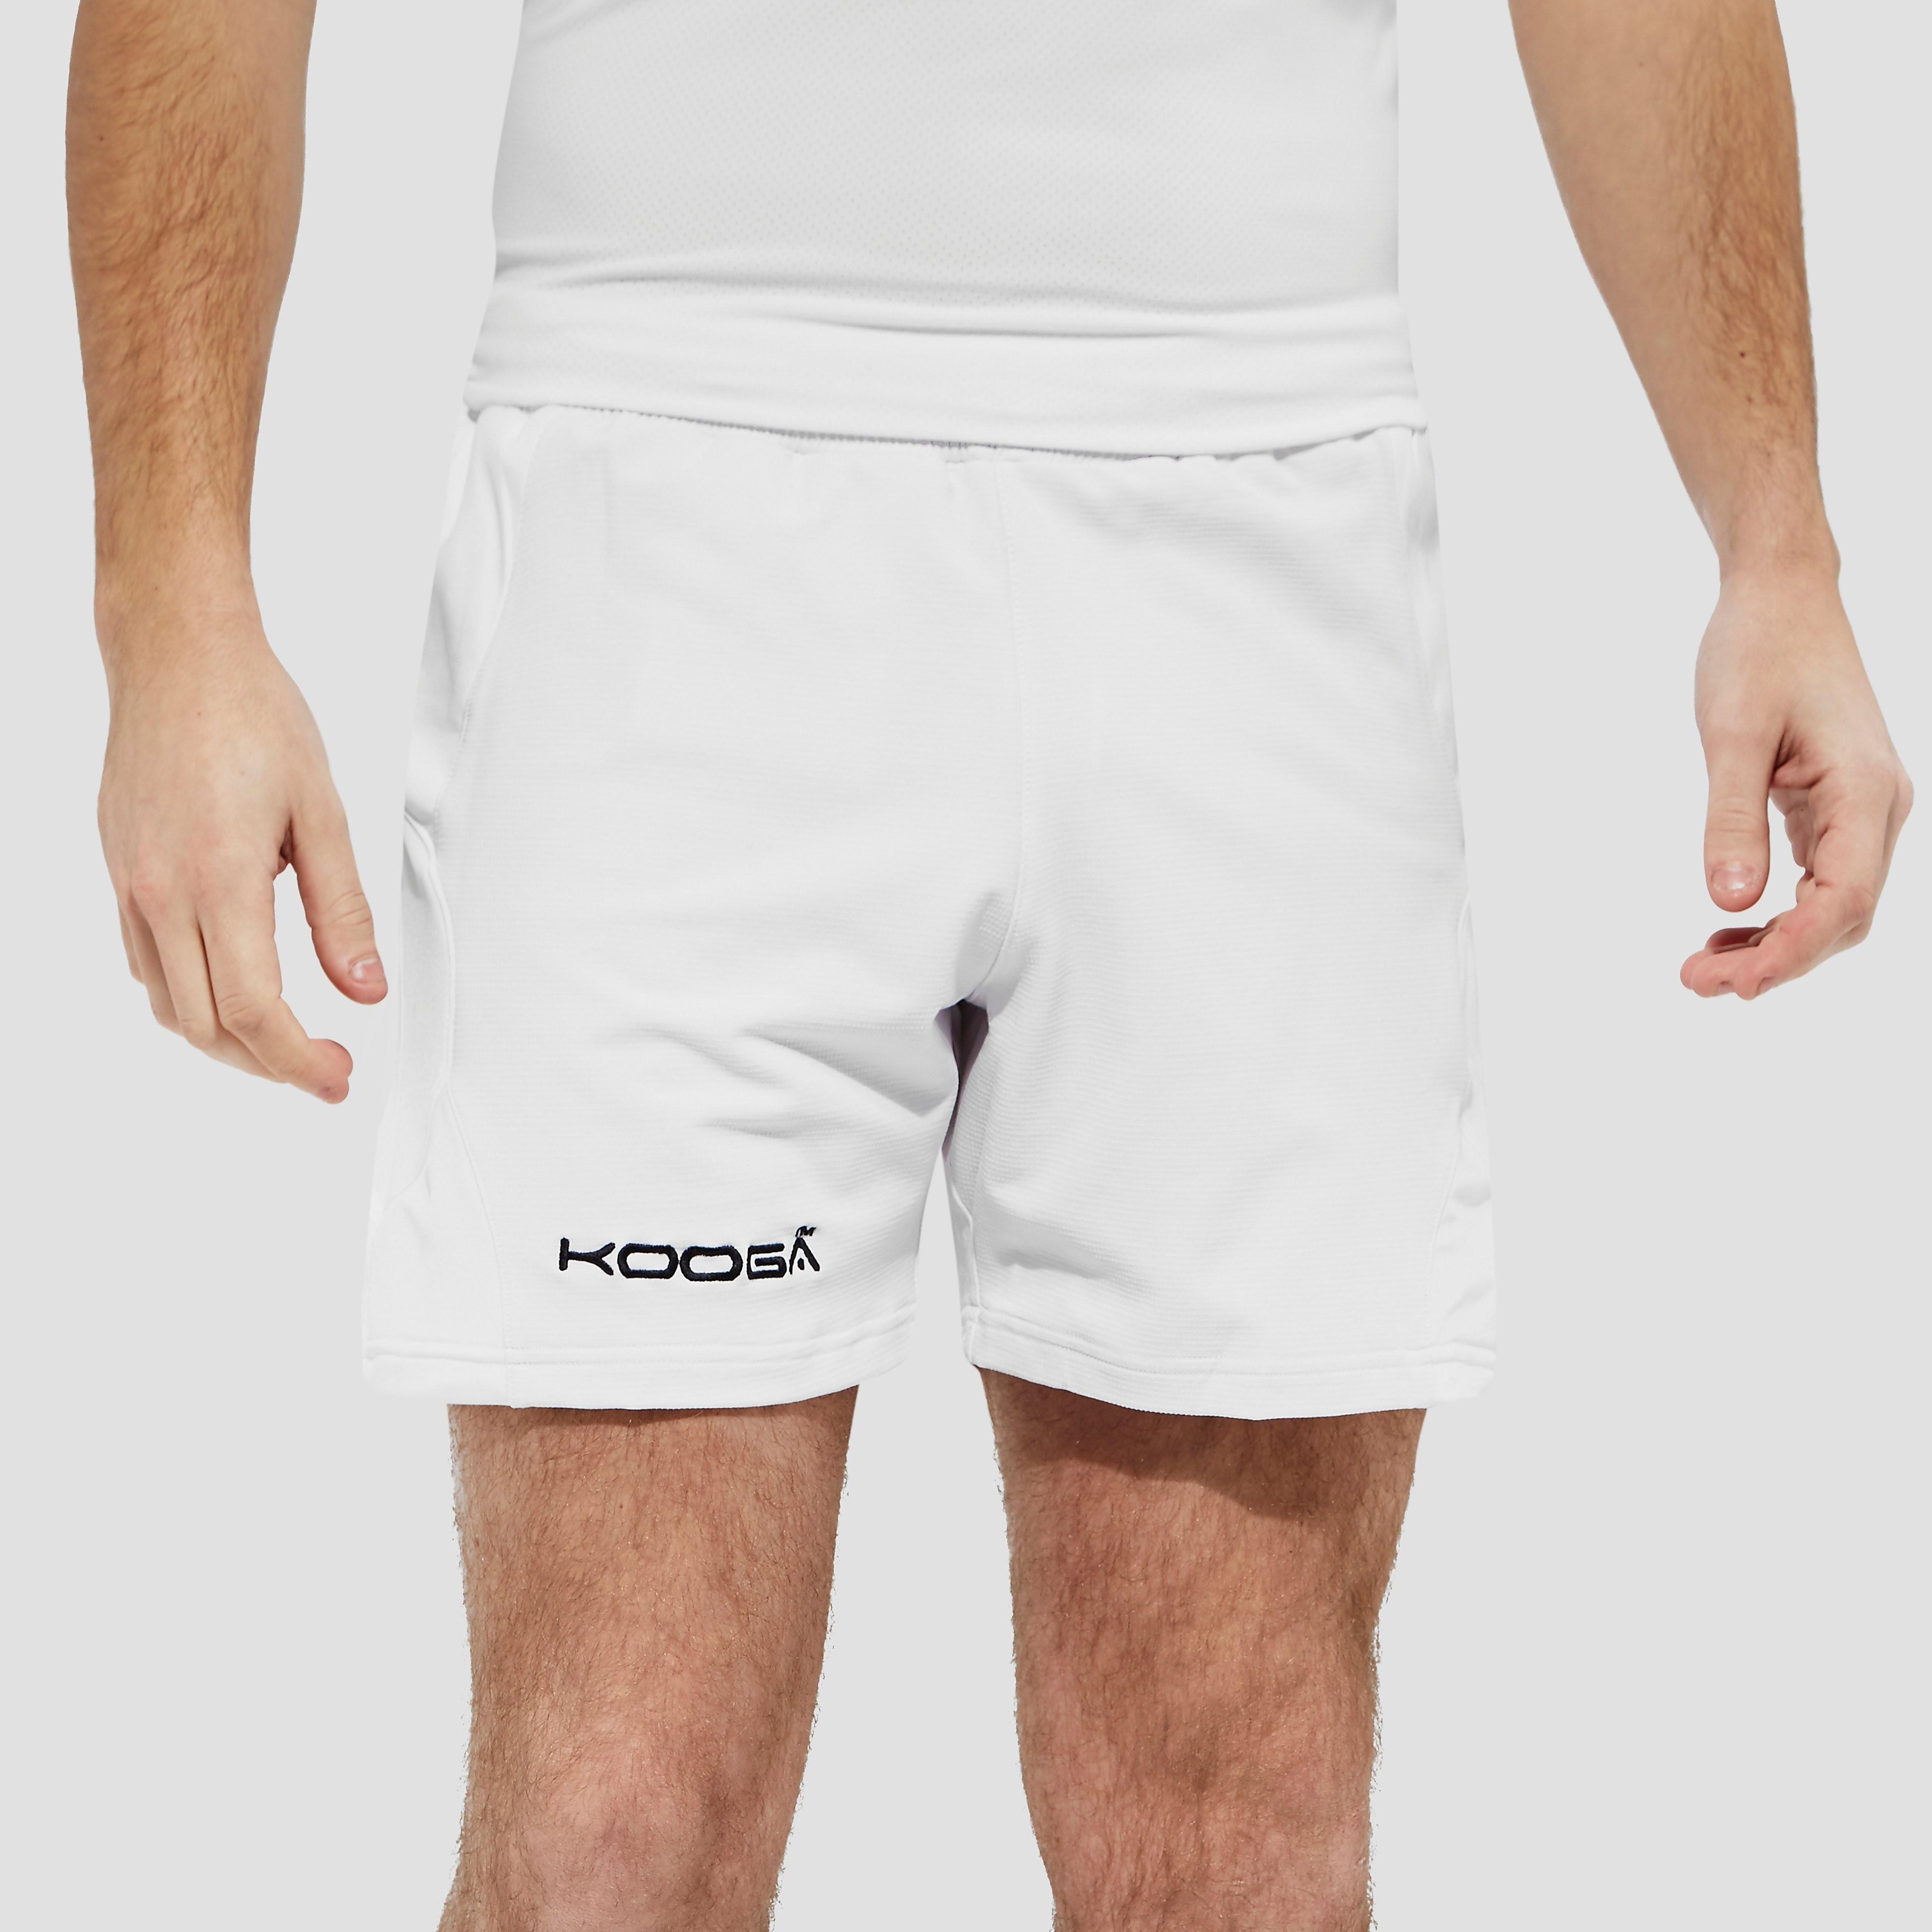 KooGa Men's Antipodean II Rugby Shorts